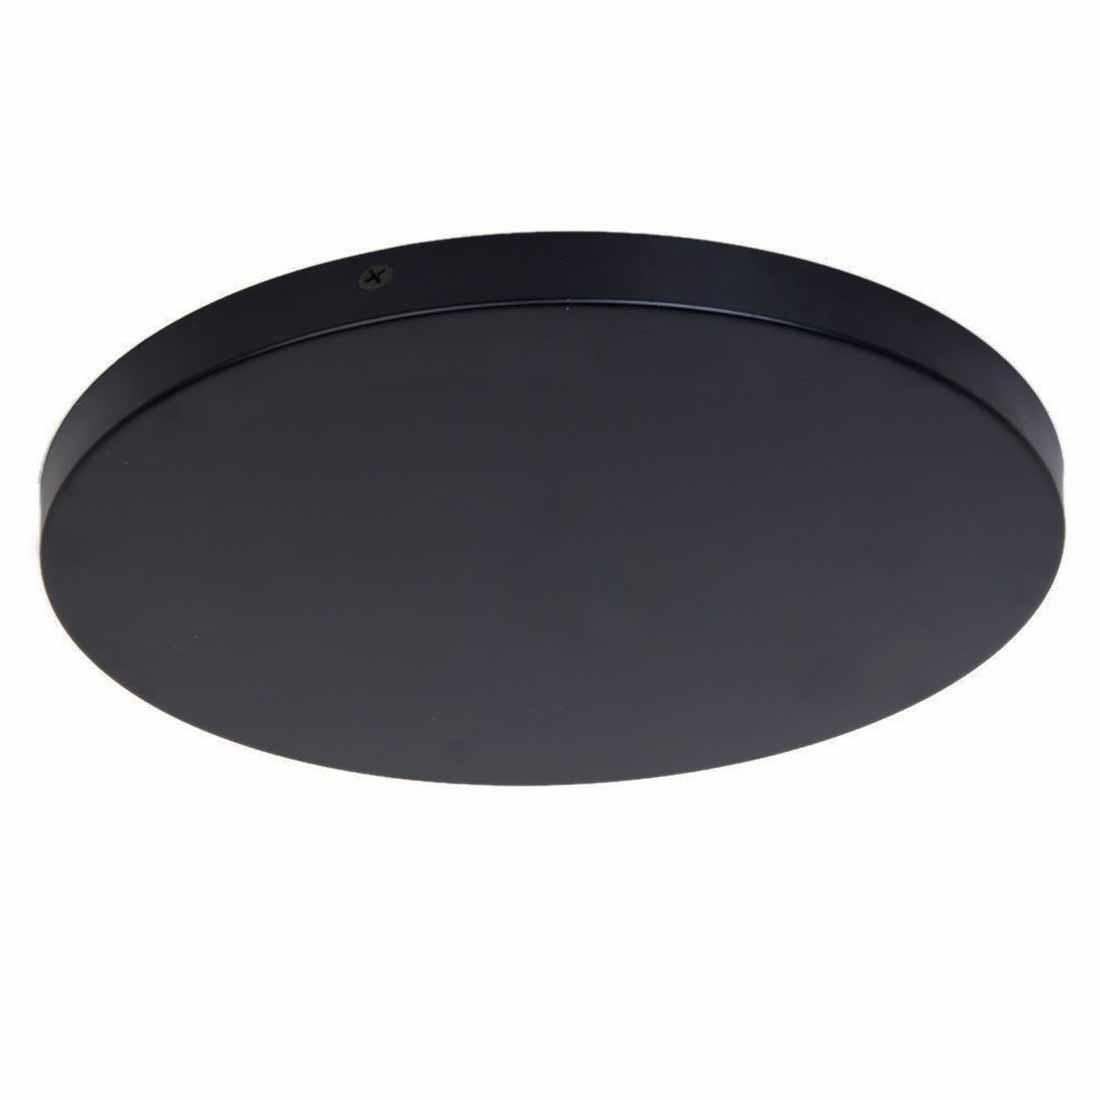 Freelight Plafondplaat Ø 45 cm zonder gaten zwart